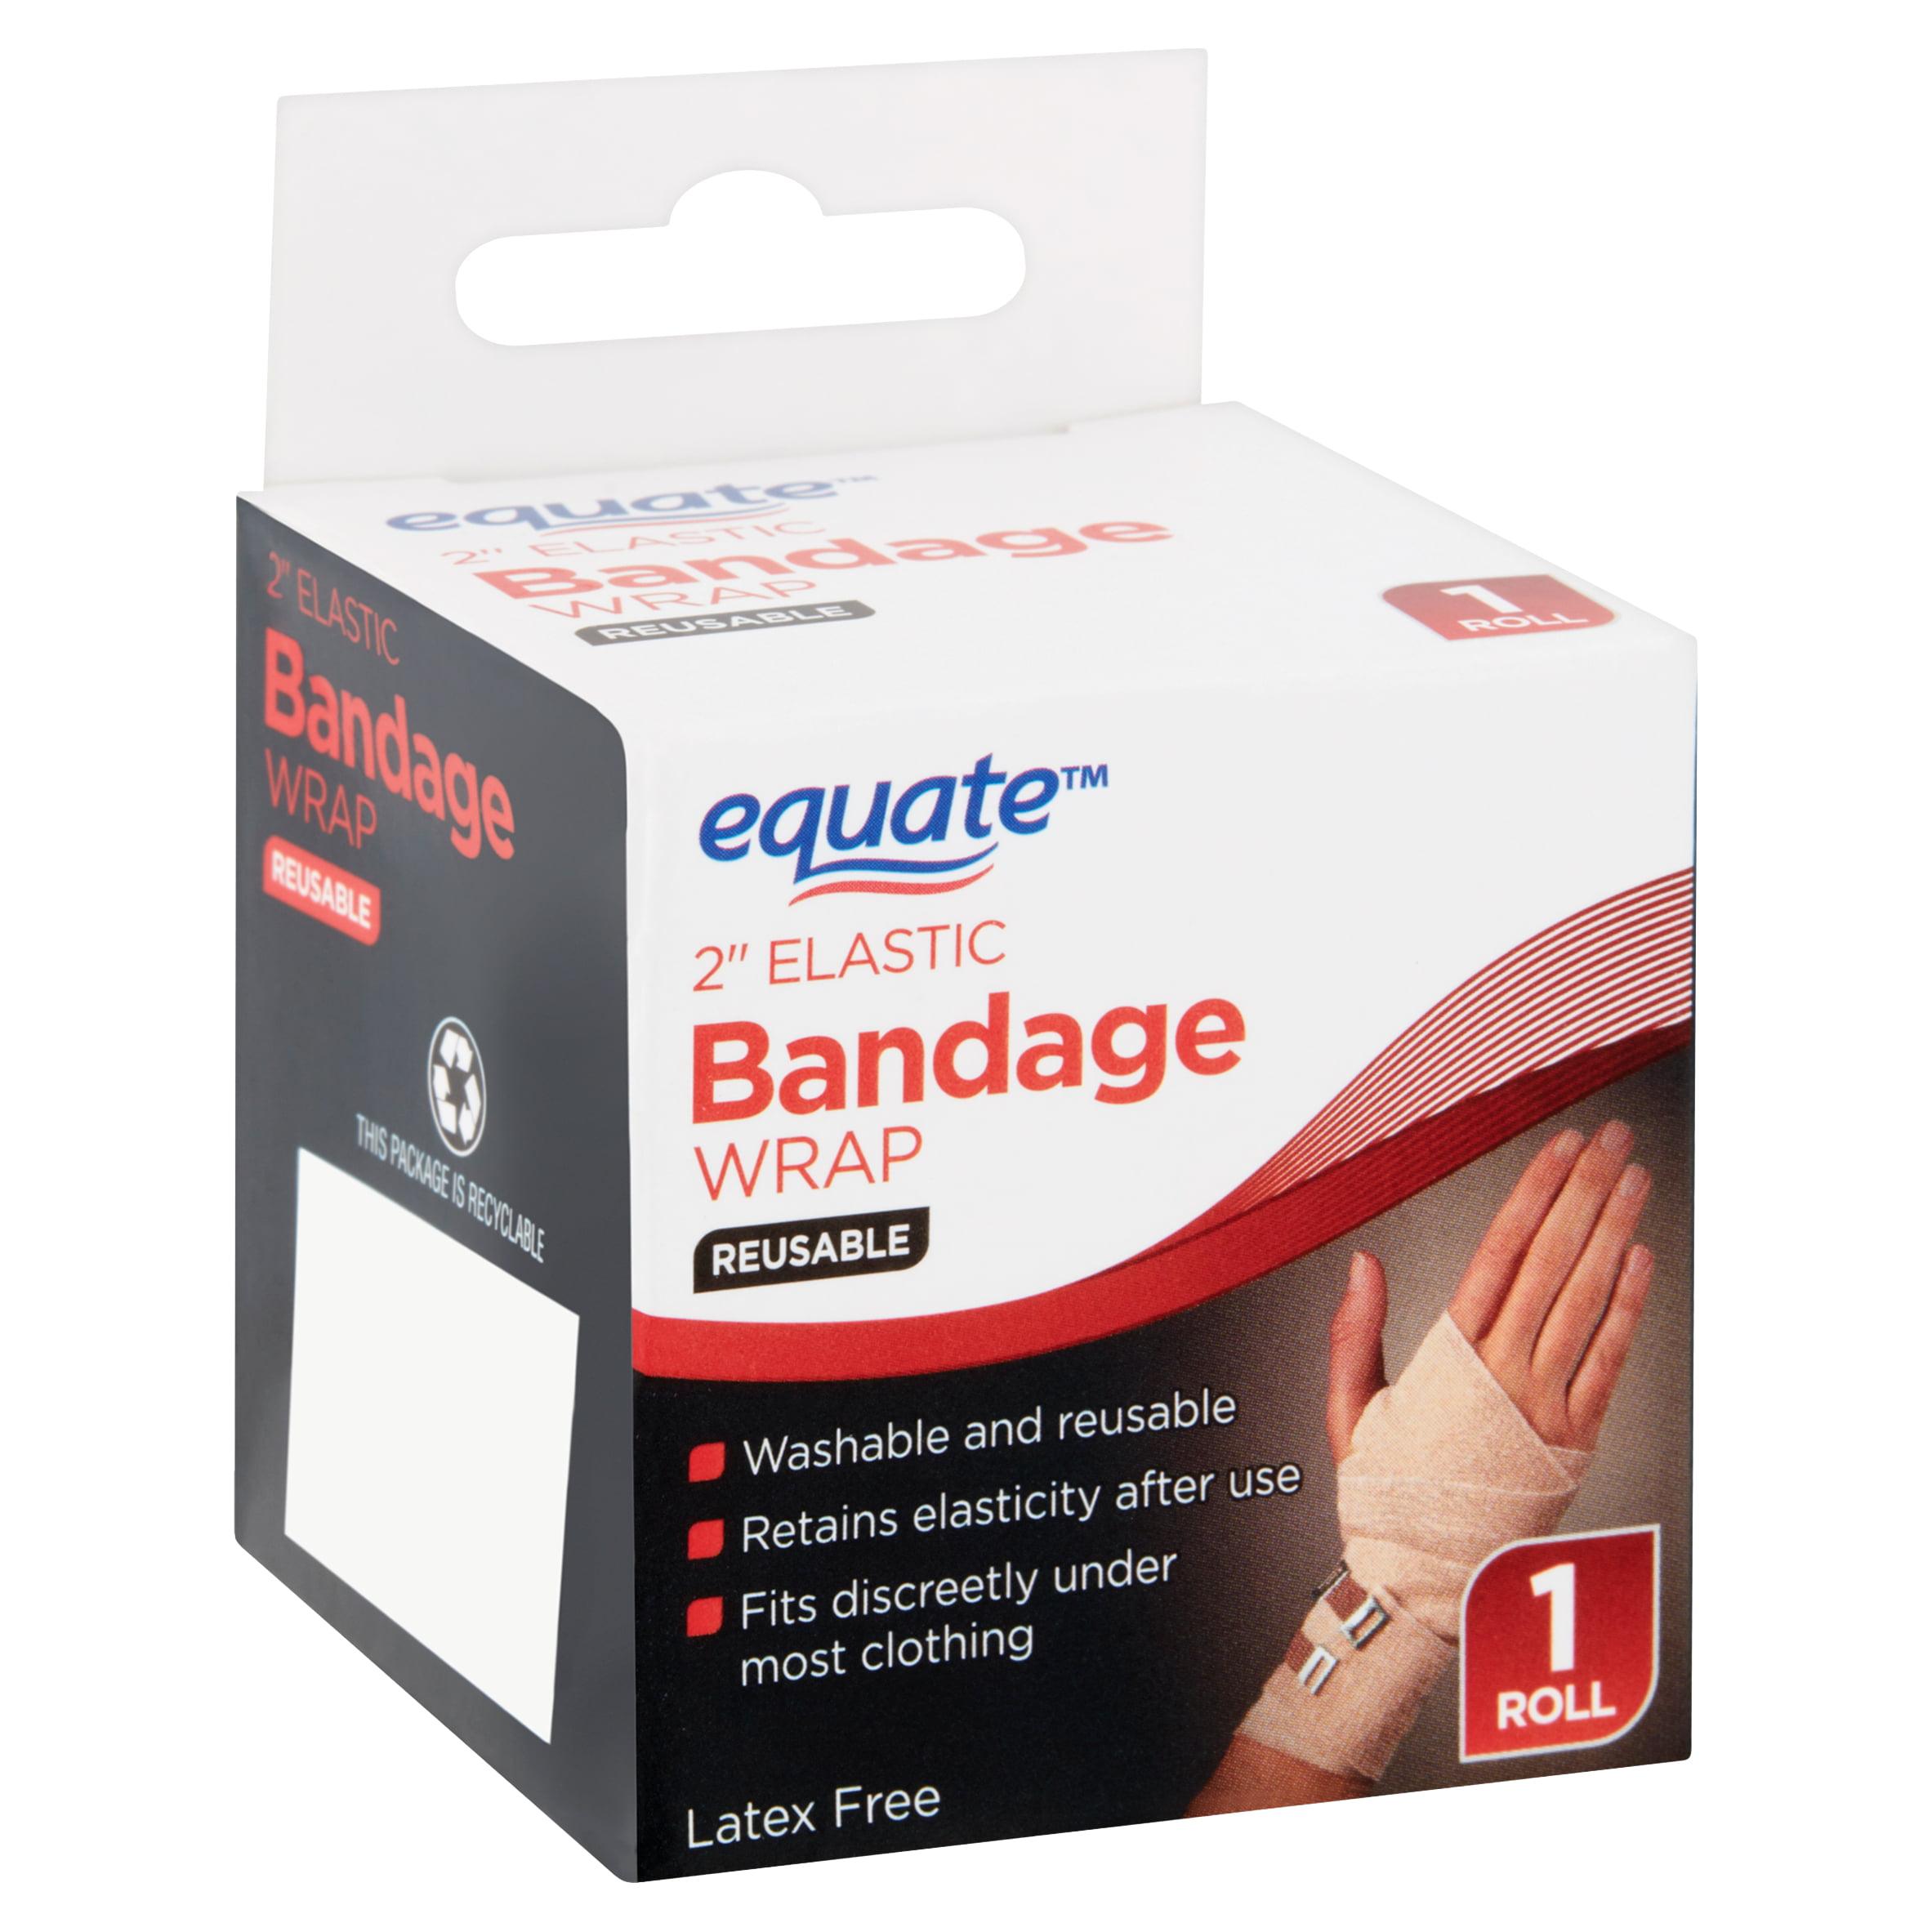 Equate 2 Elastic Bandage Wrap 1 Roll Walmart Inventory Checker